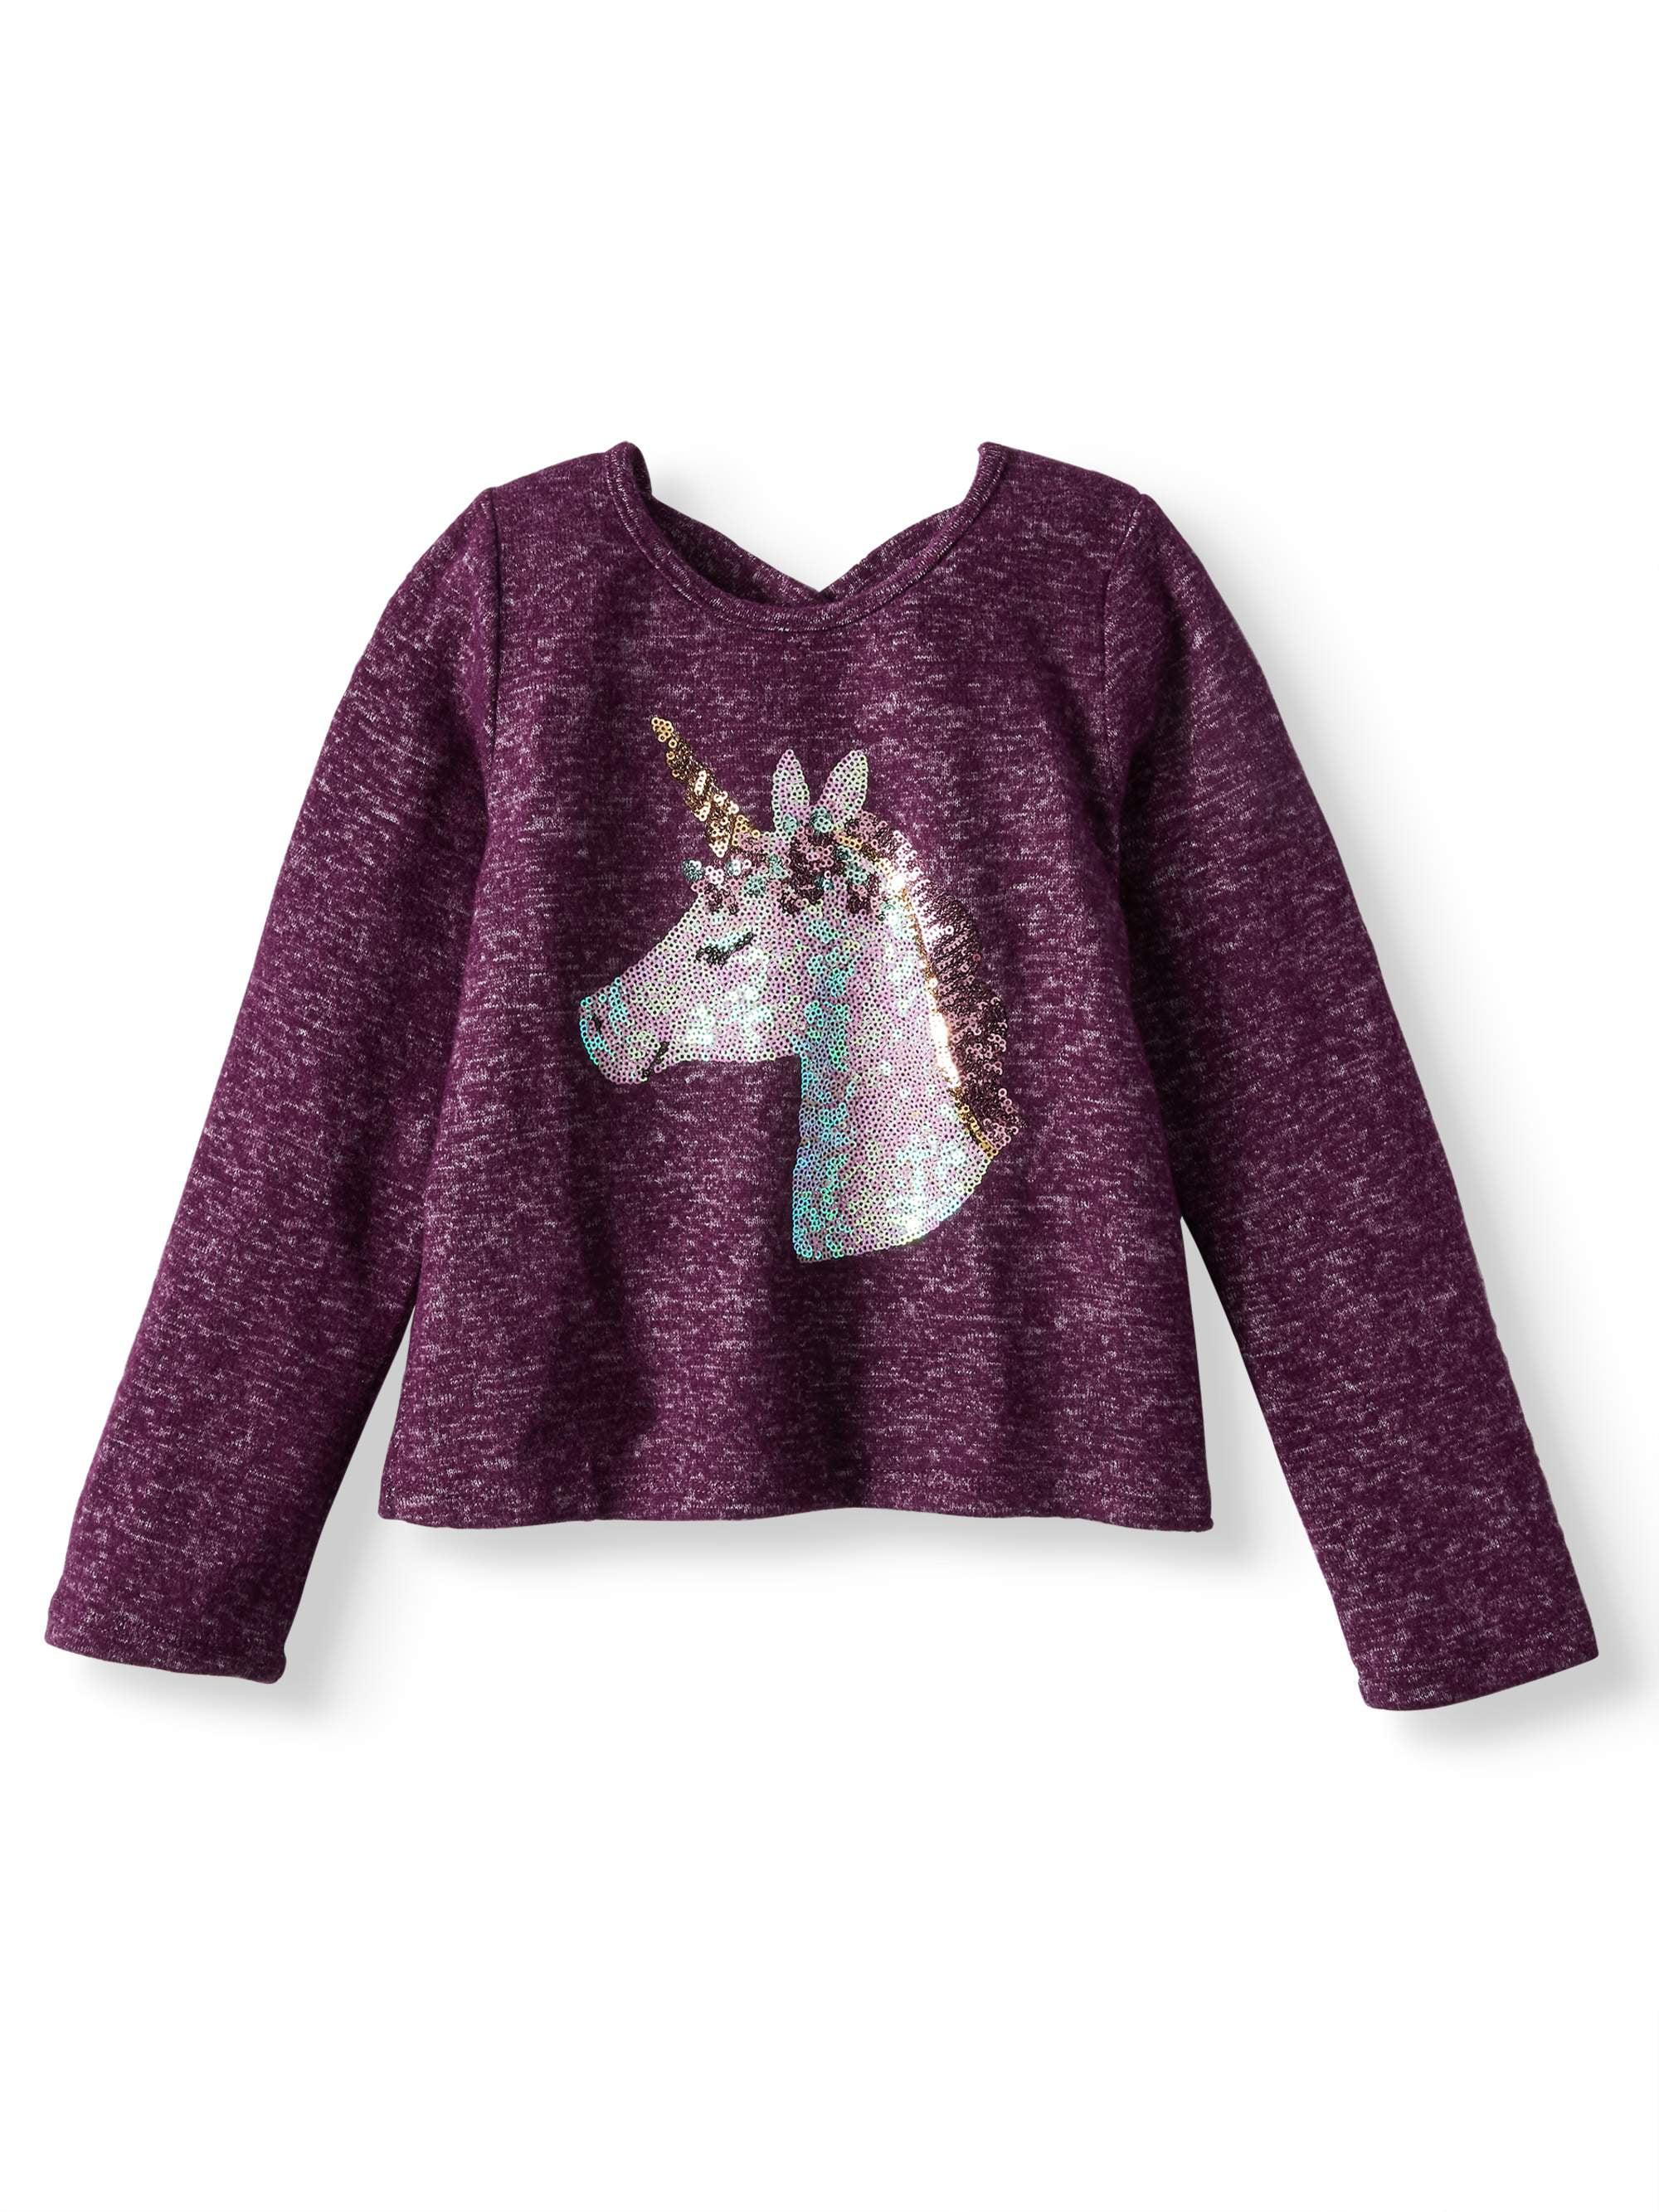 Sequin Unicorn Sweater Knit Top (Little Girls)